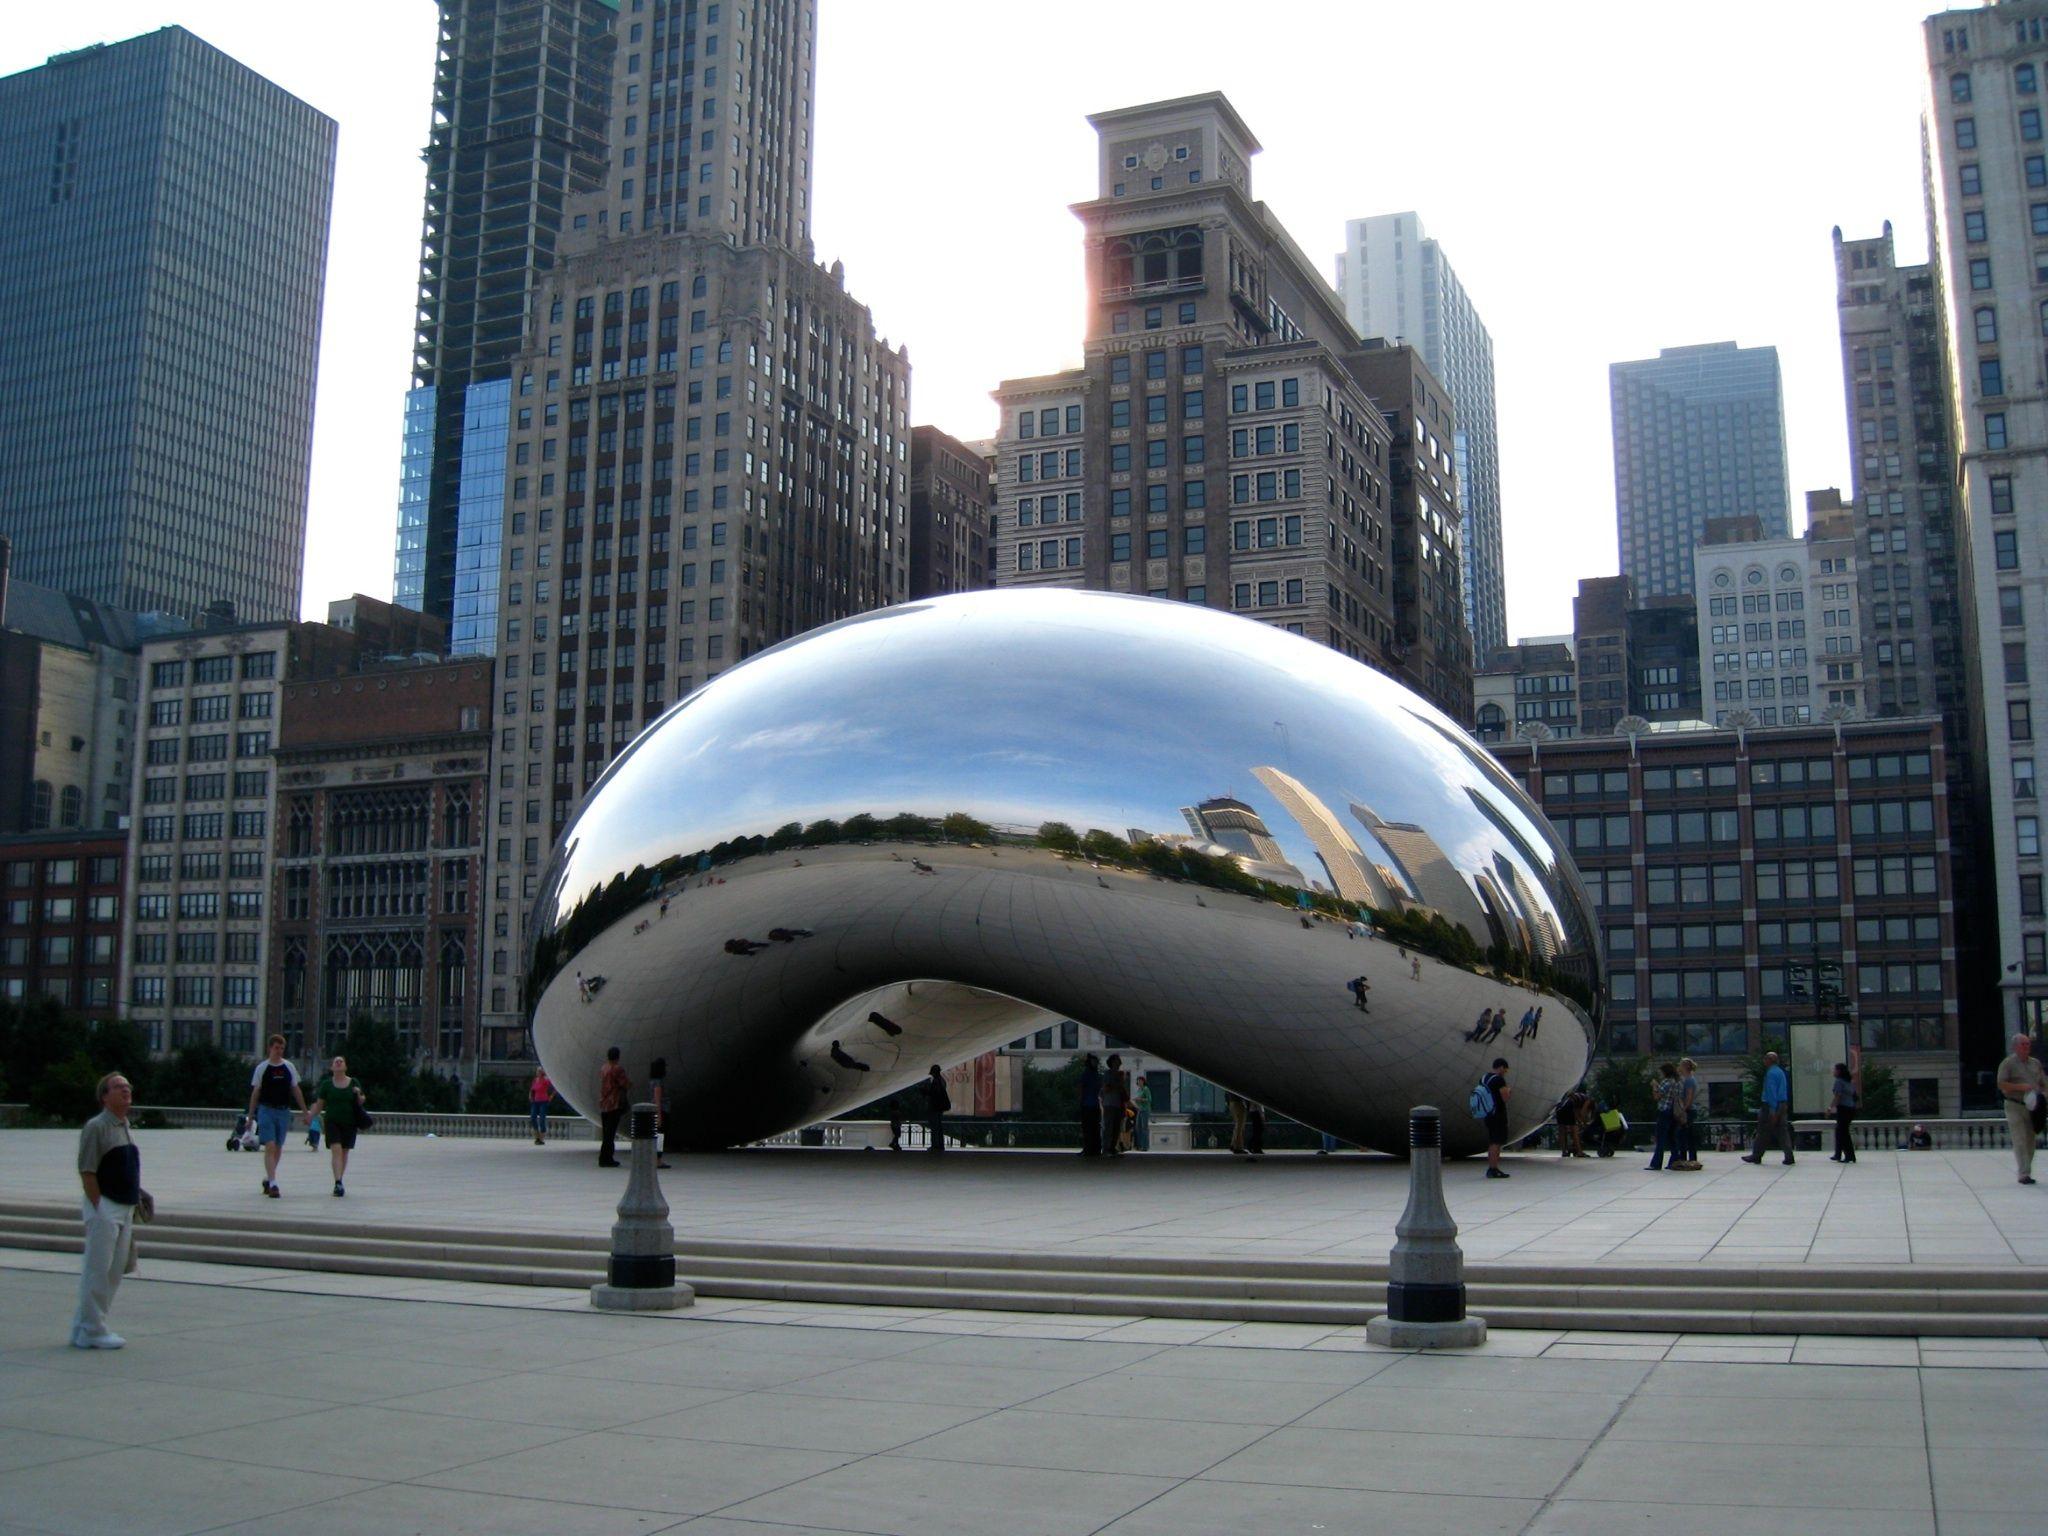 chicago landmark the bean 24 hour locksmiths our technicians